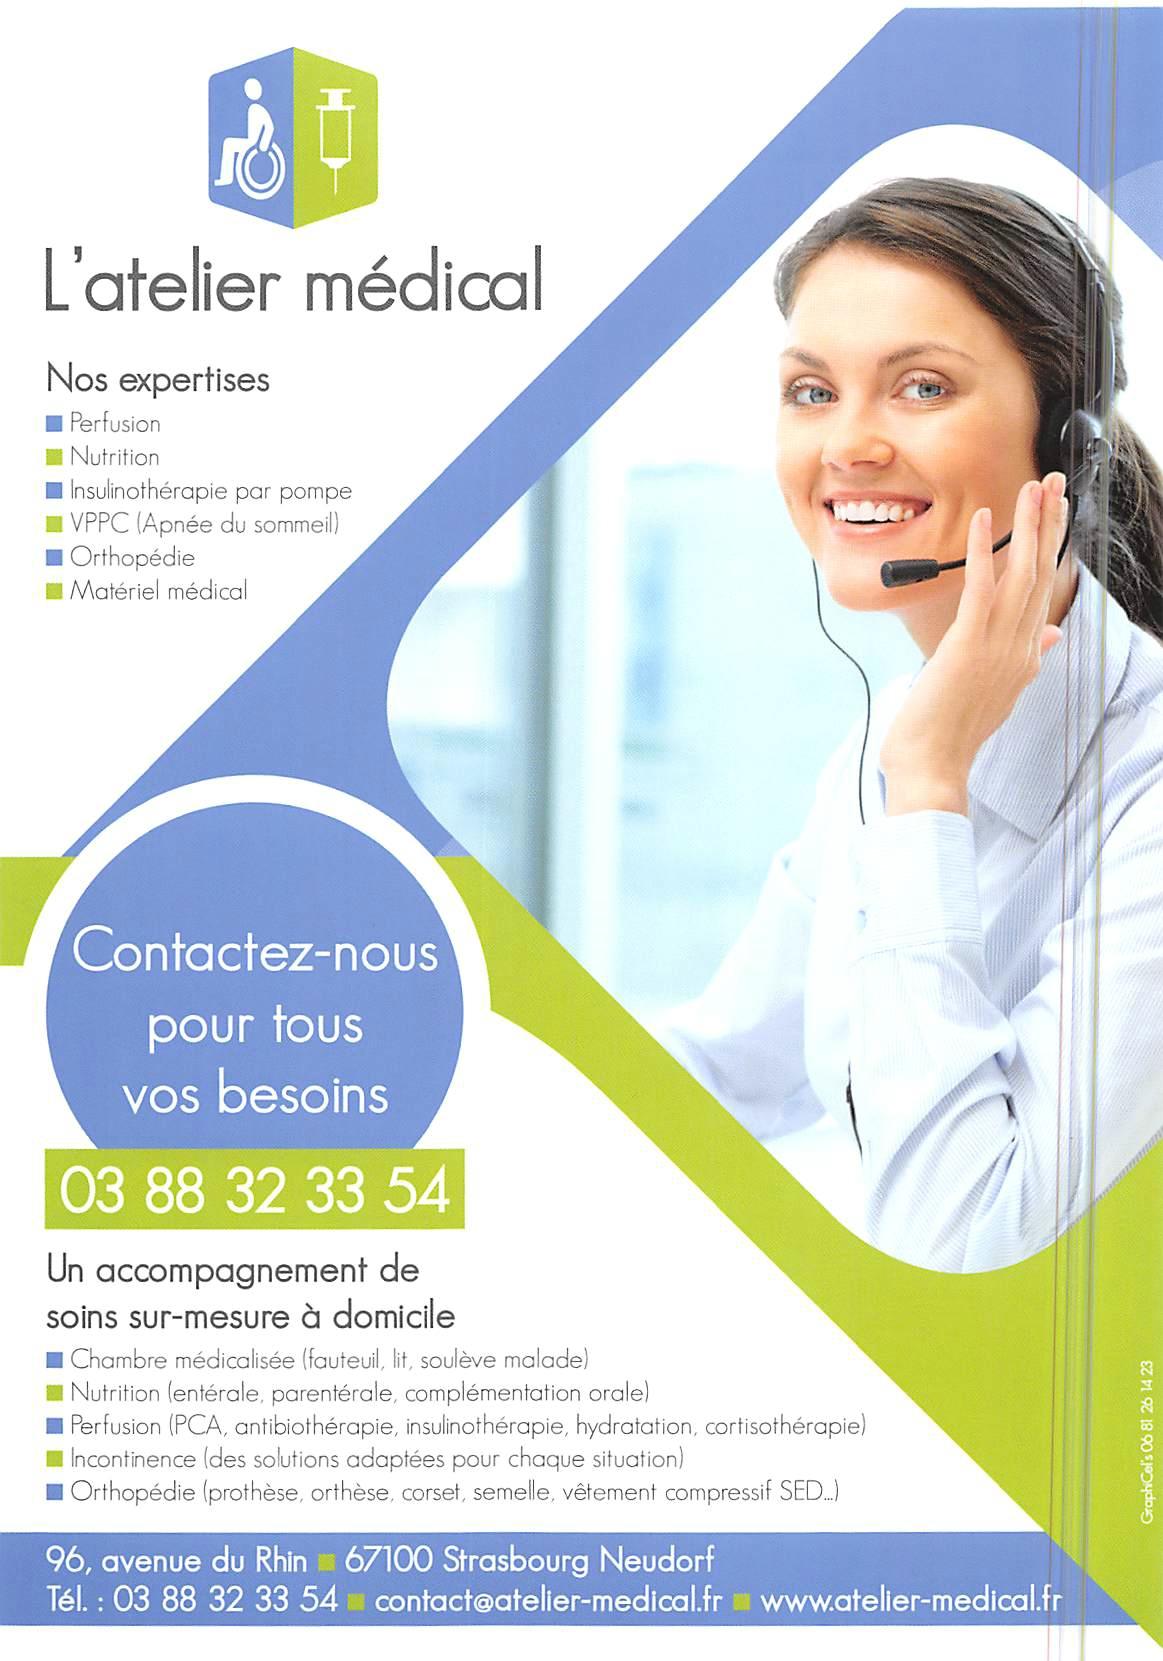 https://atelier-medical.fr/wp-content/uploads/2018/10/flyer-oct-18.jpg